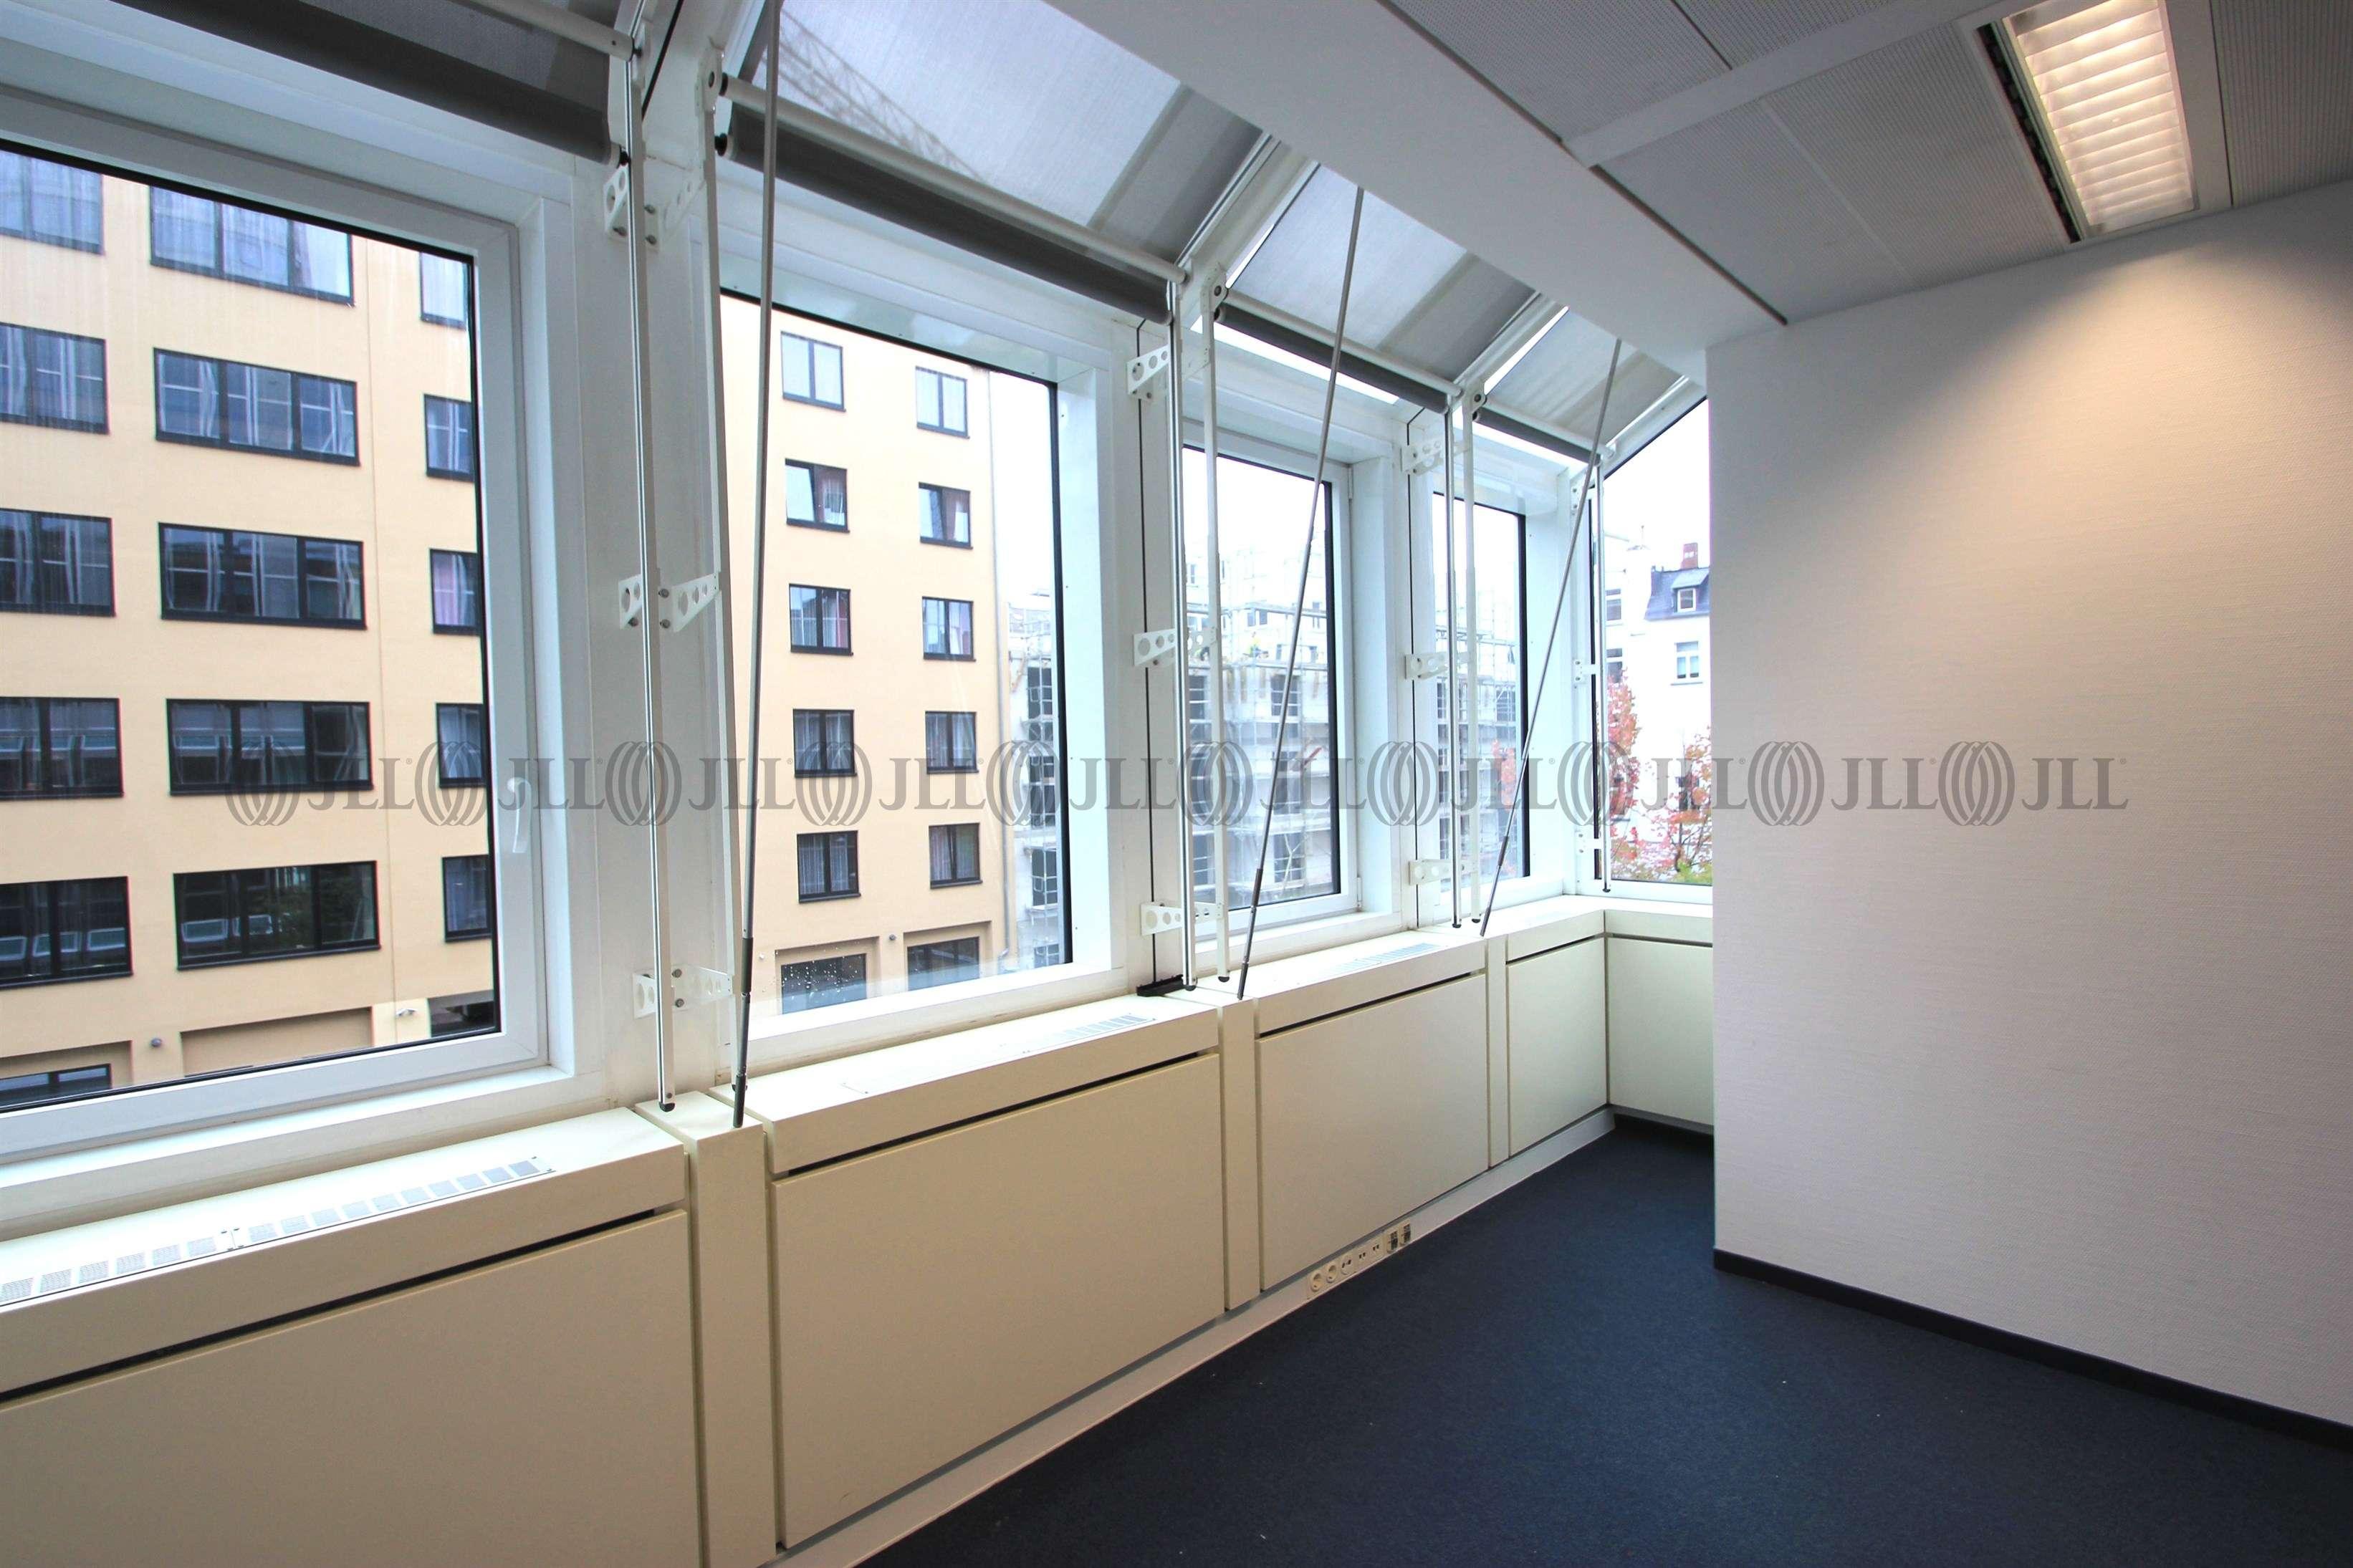 Büros Frankfurt am main, 60329 - Büro - Frankfurt am Main, Bahnhofsviertel - F0210 - 10054244